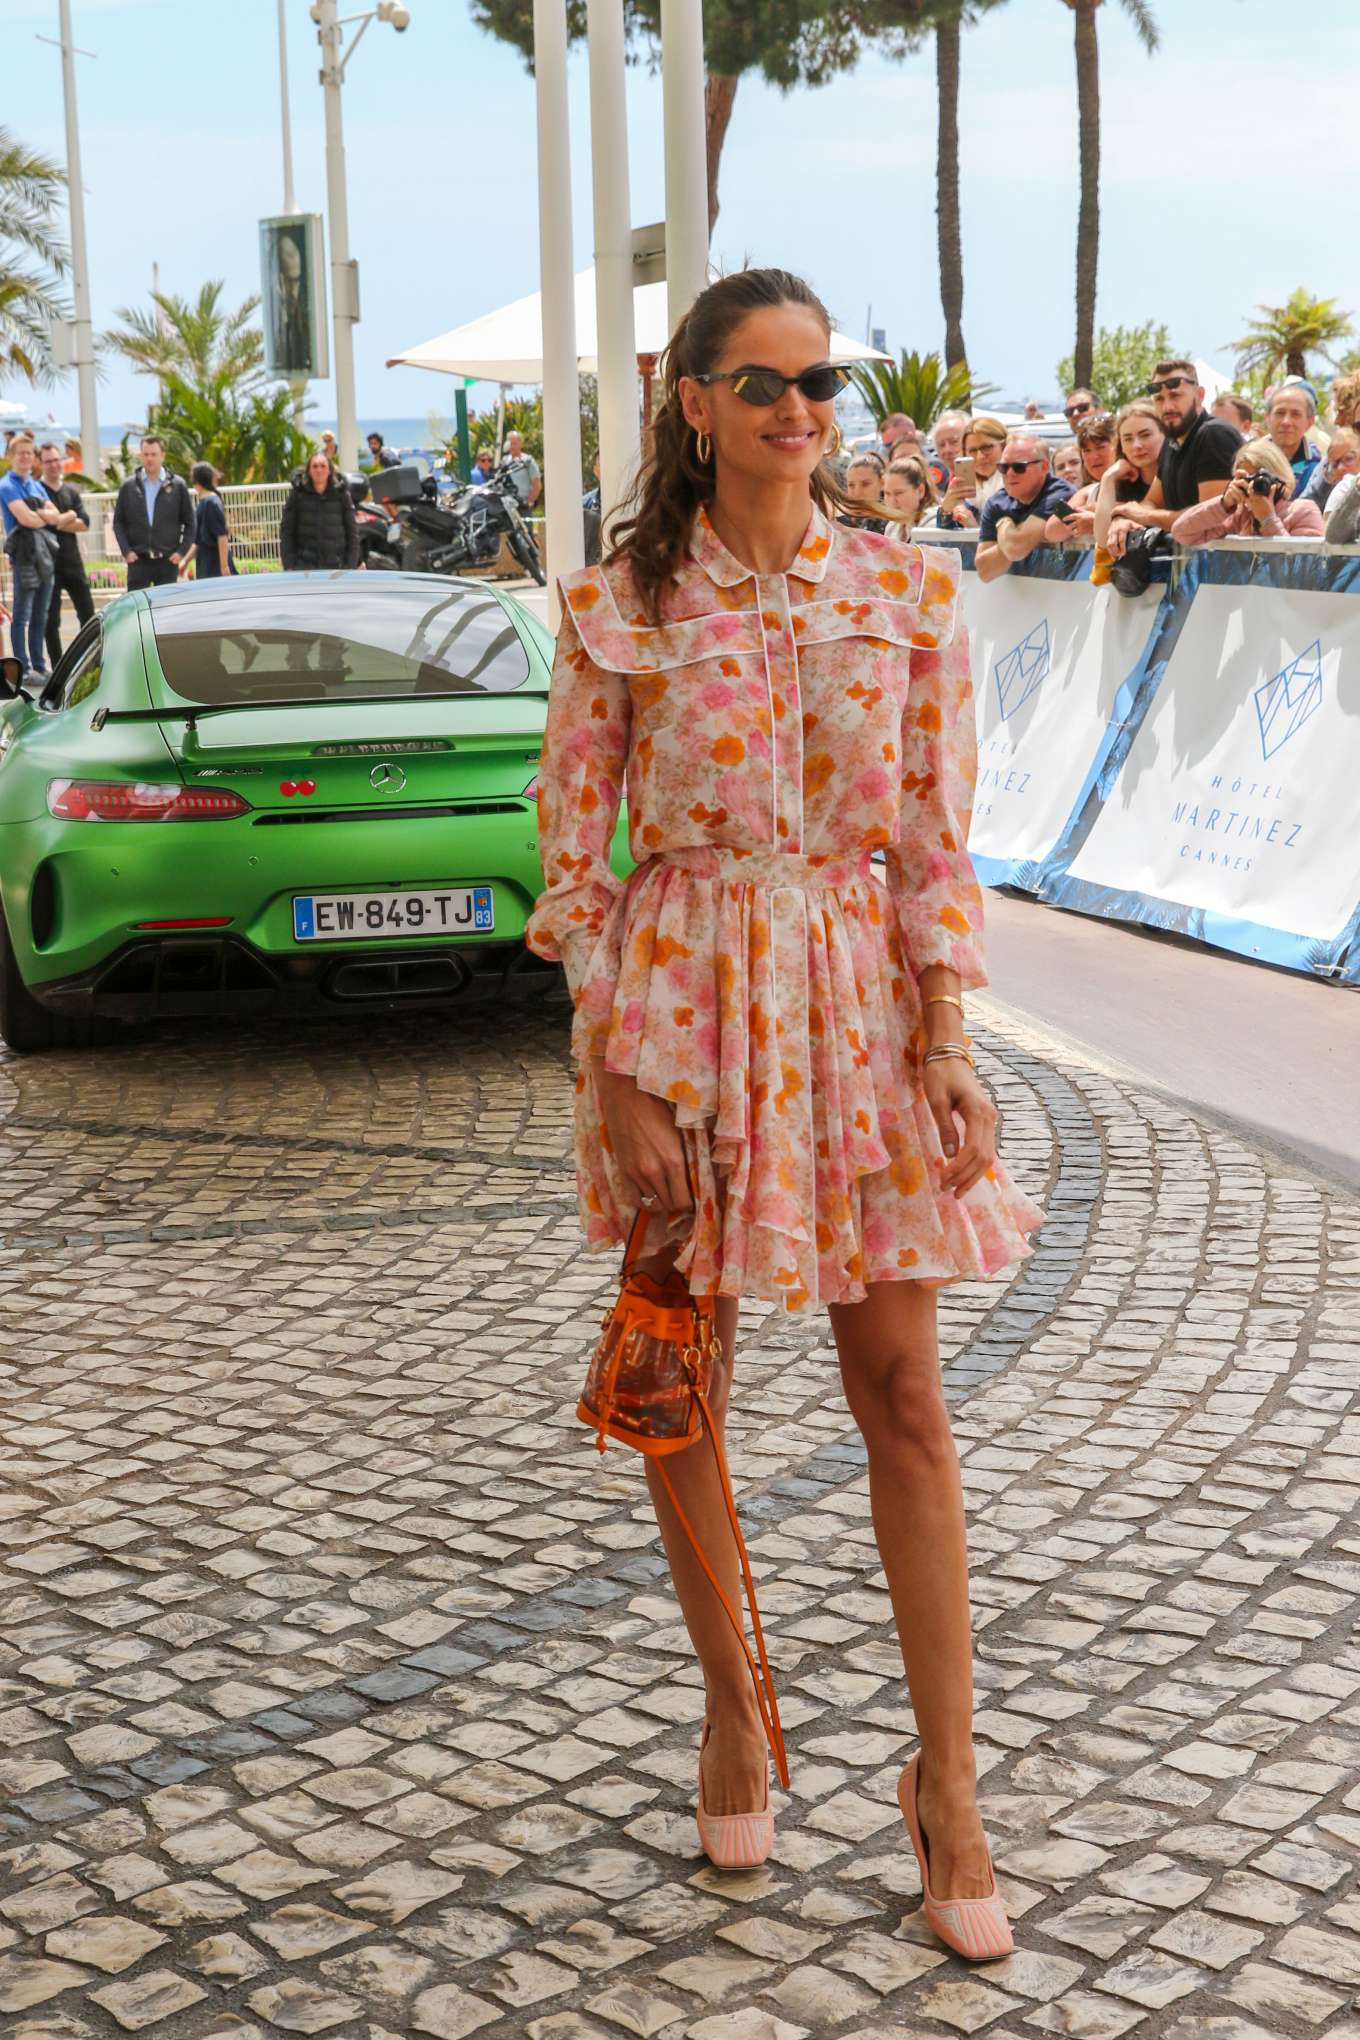 Izabel Goulart 2019 : Izabel Goulart in Floral Print Dress at the Martinez Hotel-14